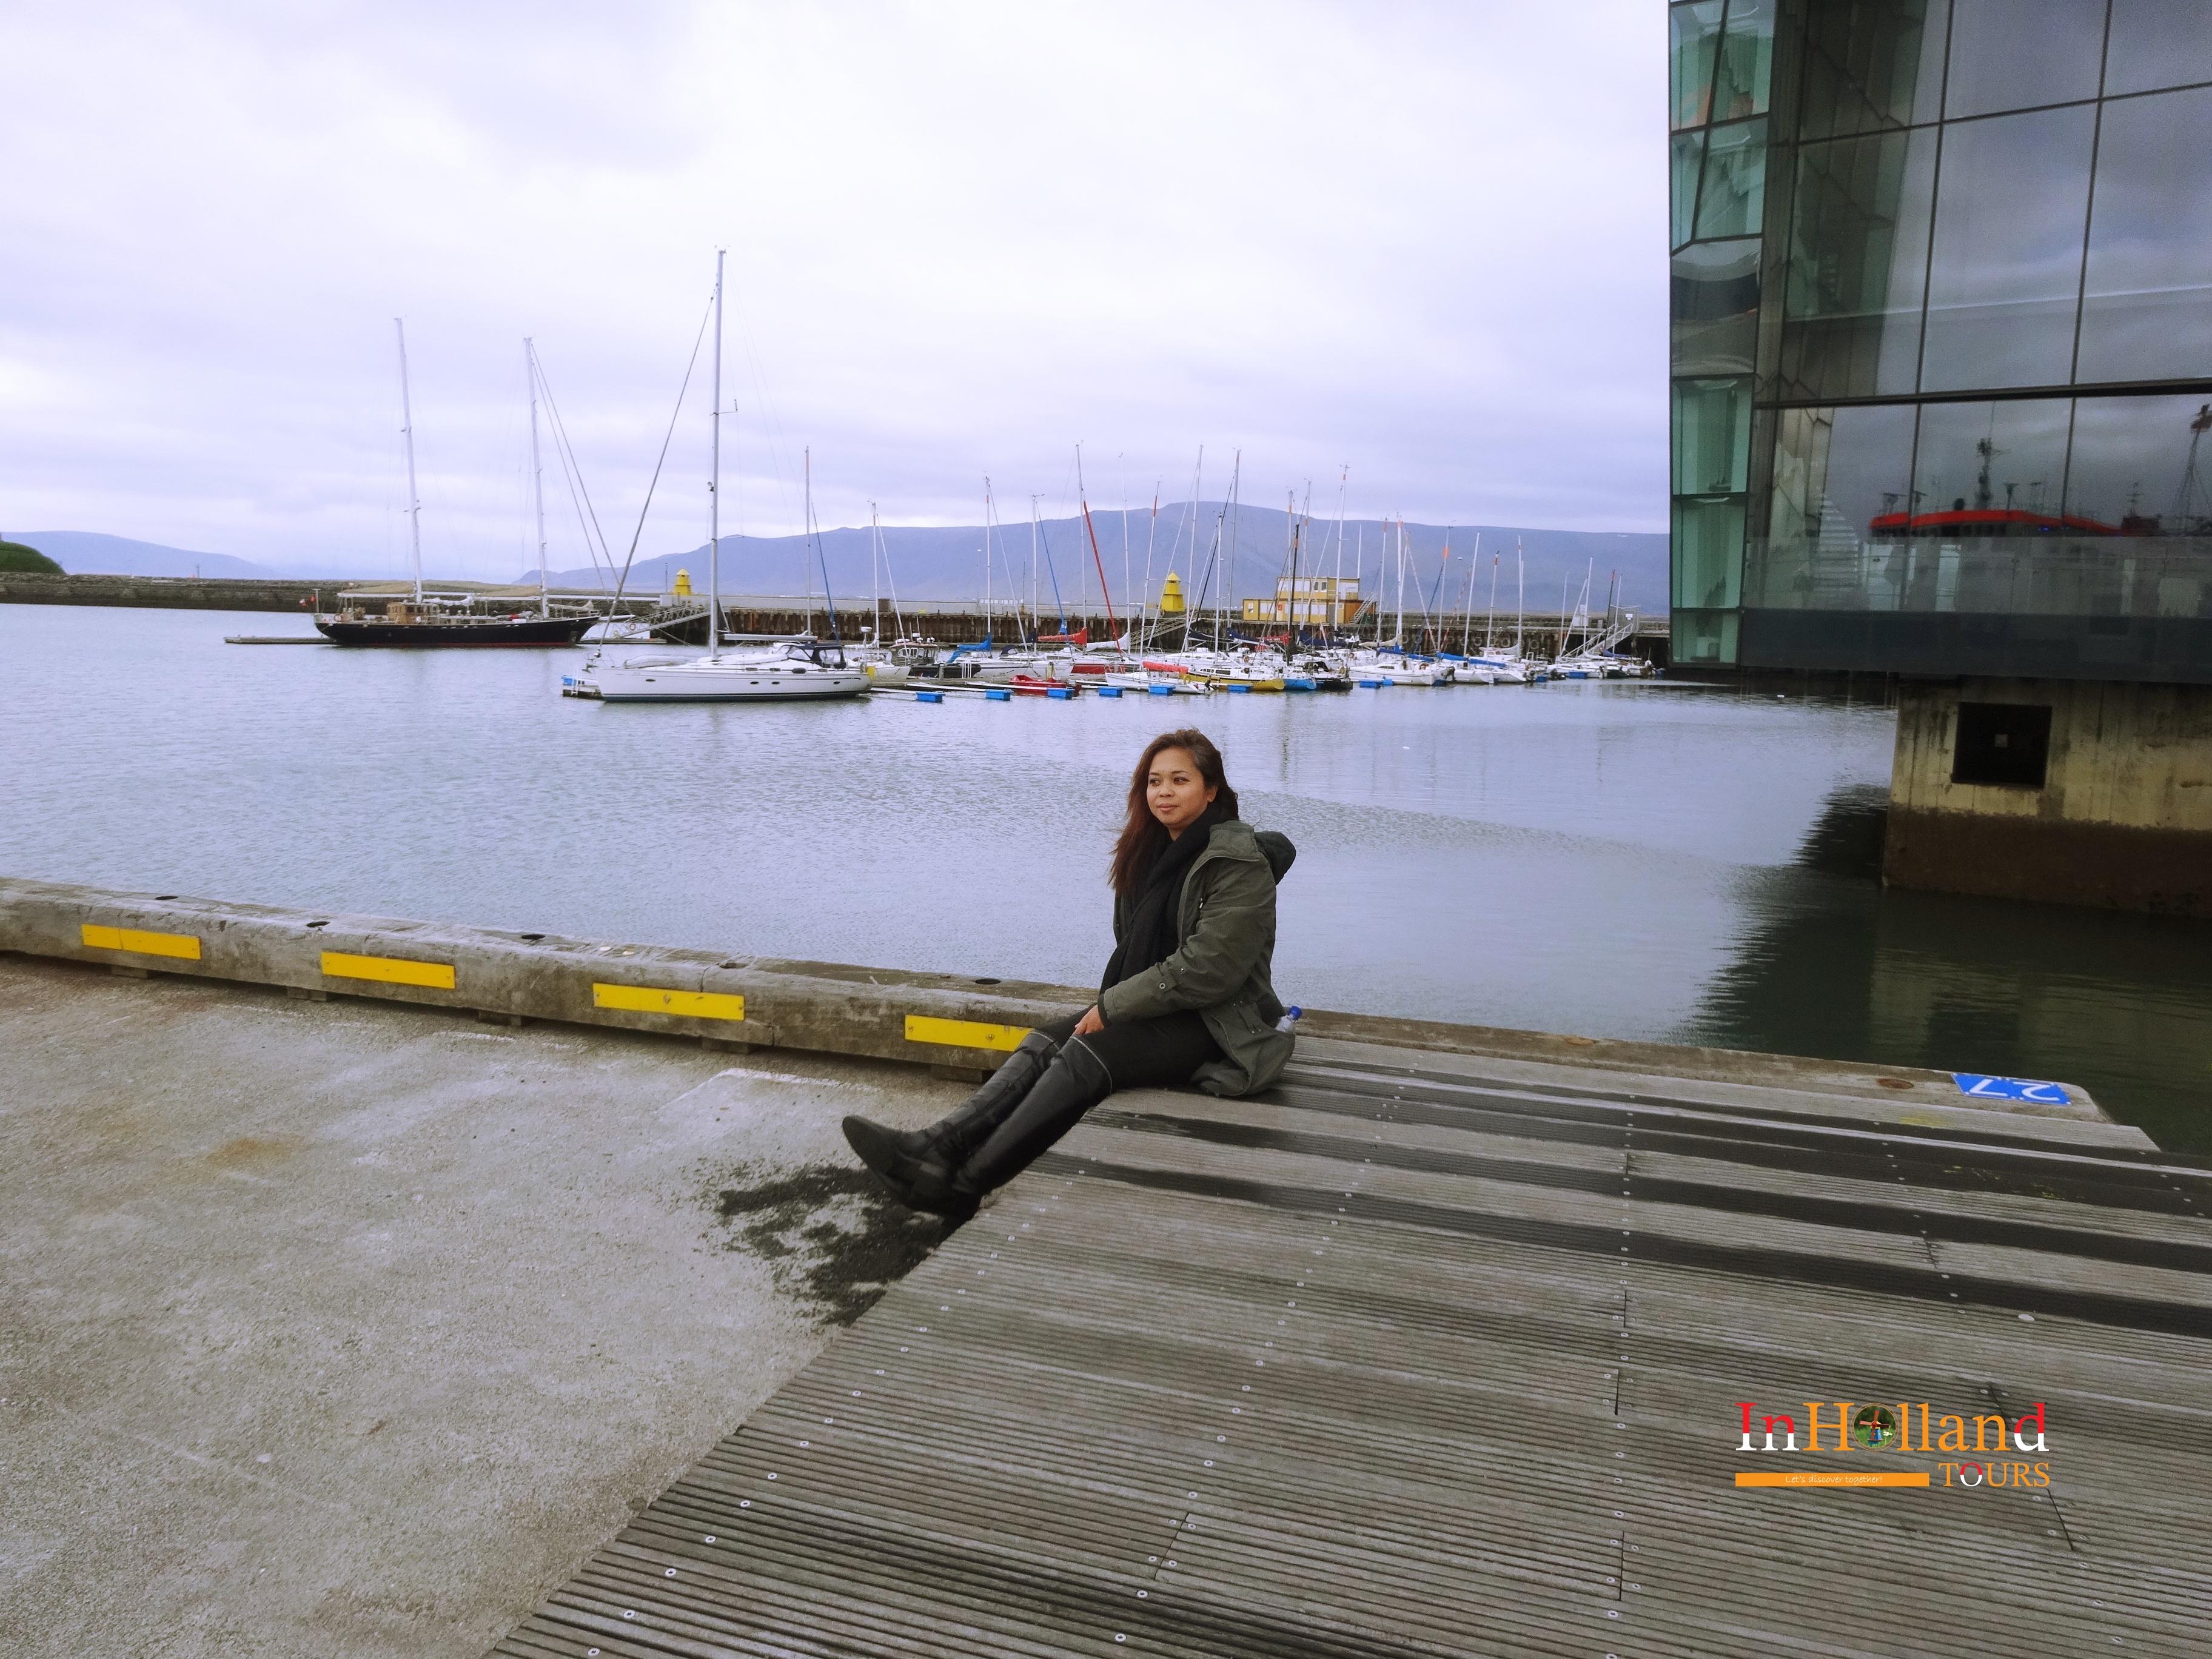 opera house di islandia